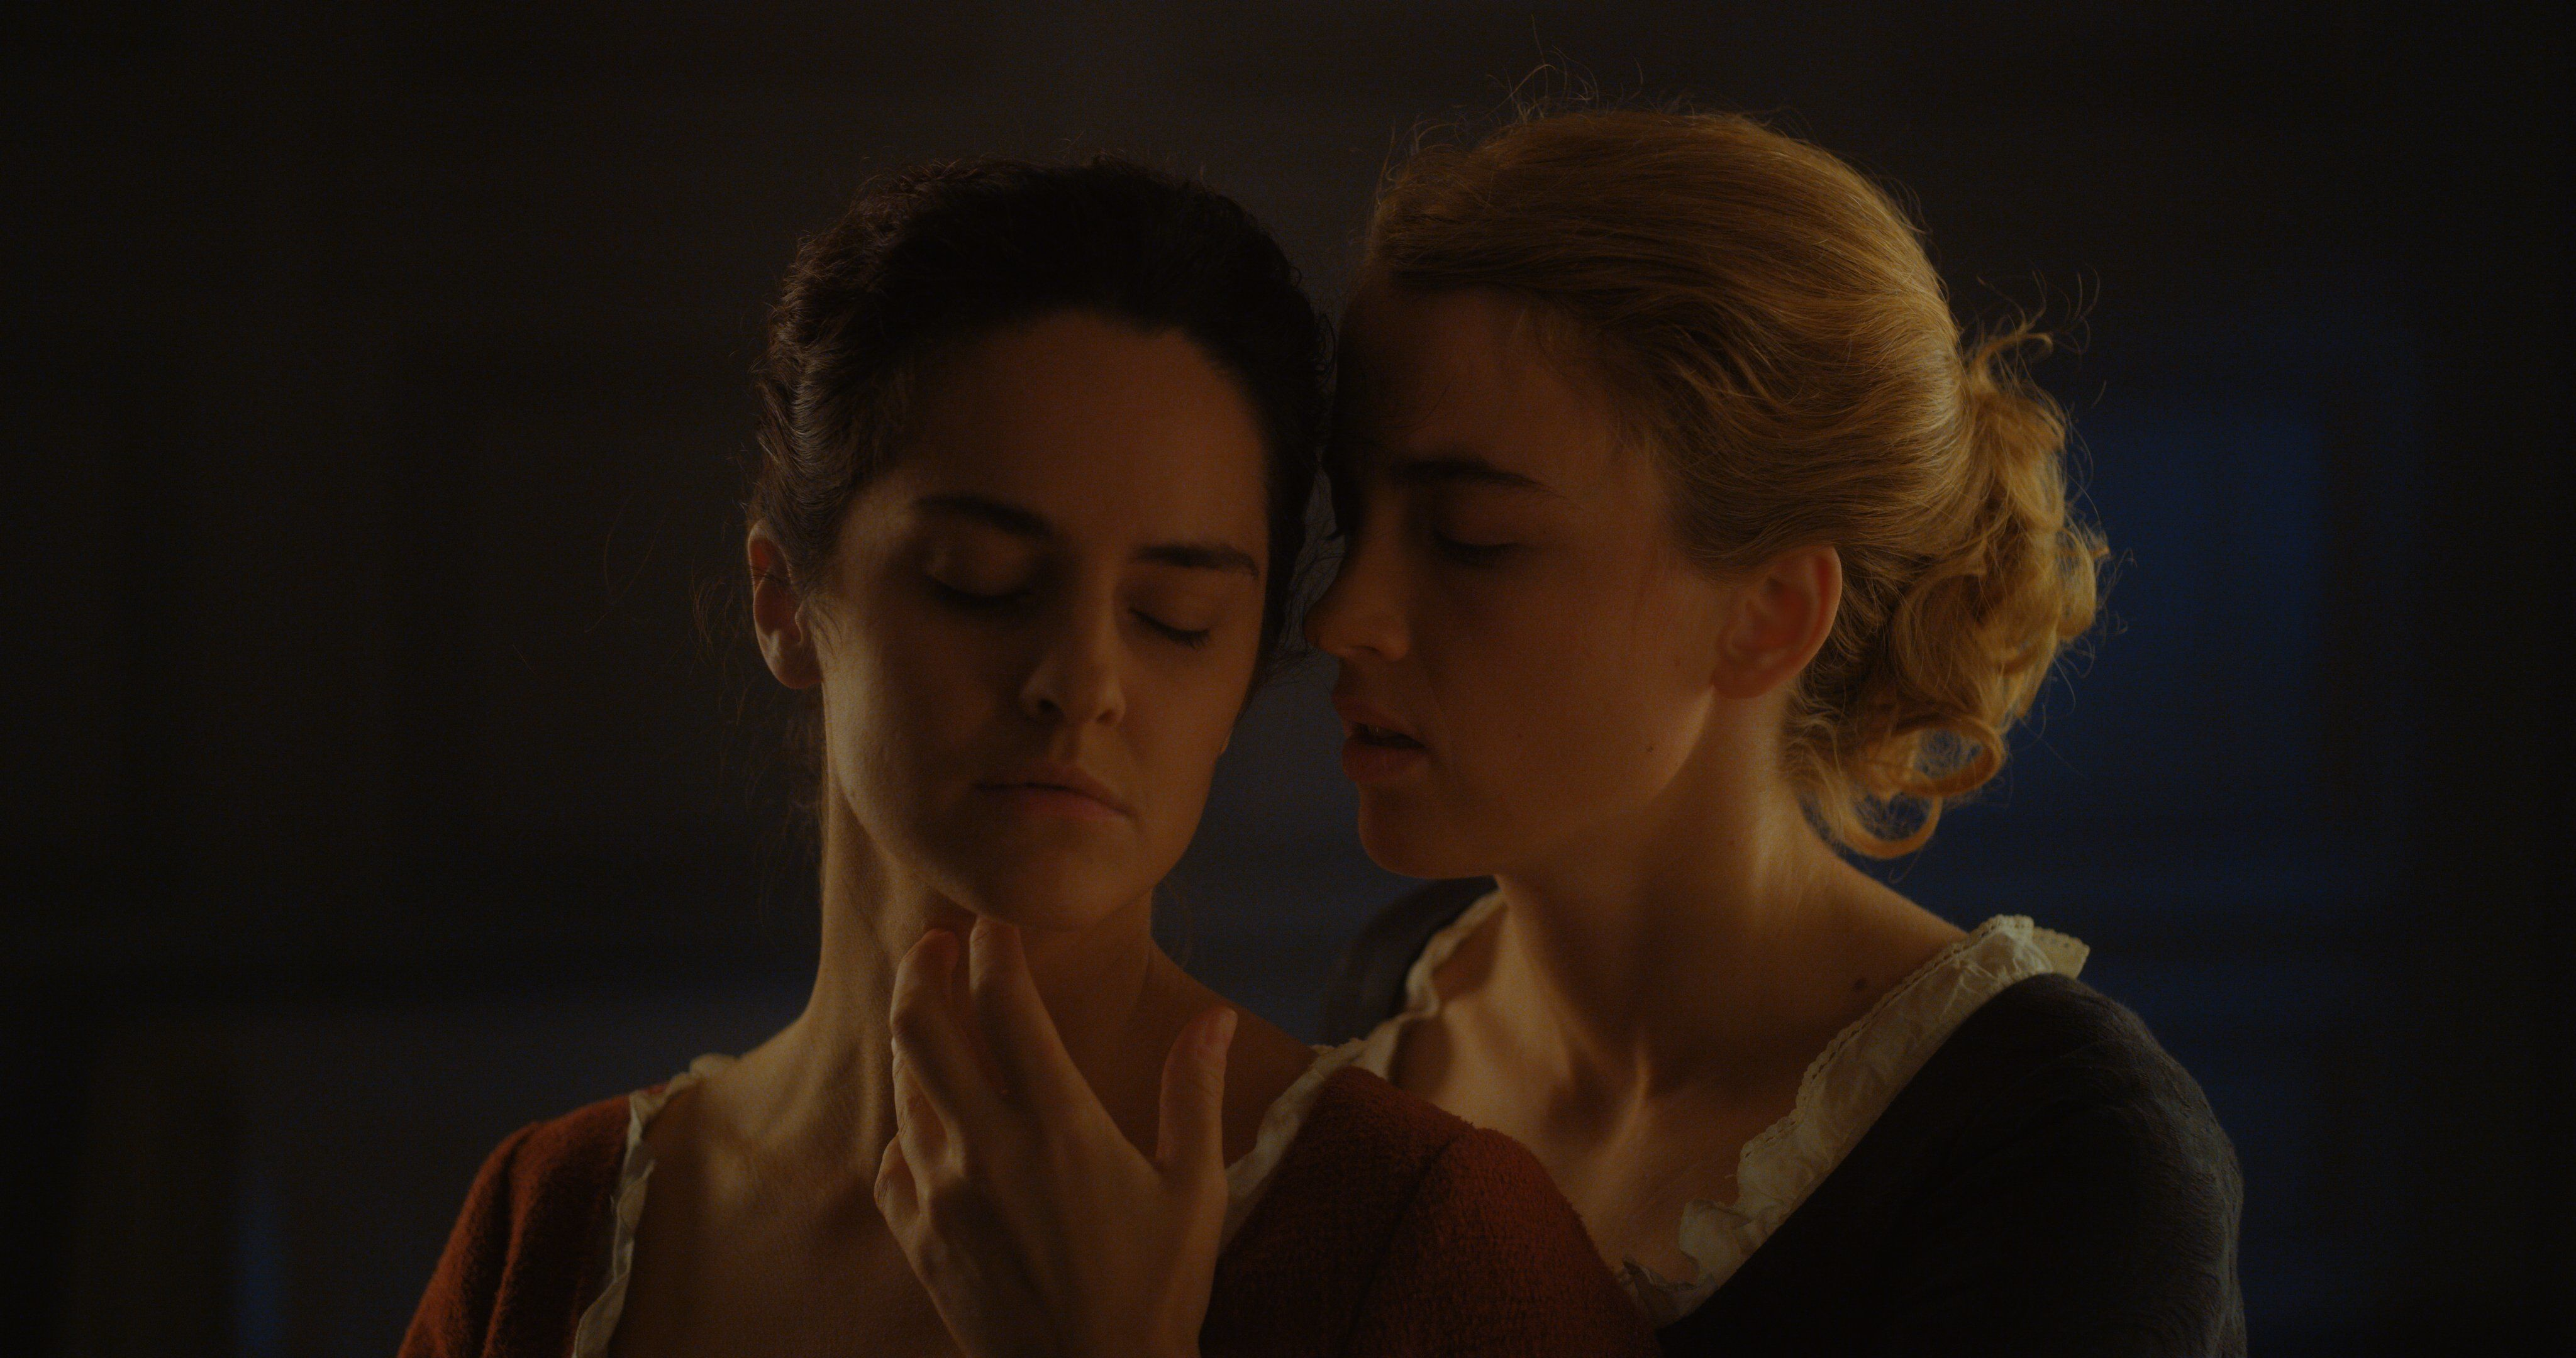 Noémie Merlant e Adèle Haenel